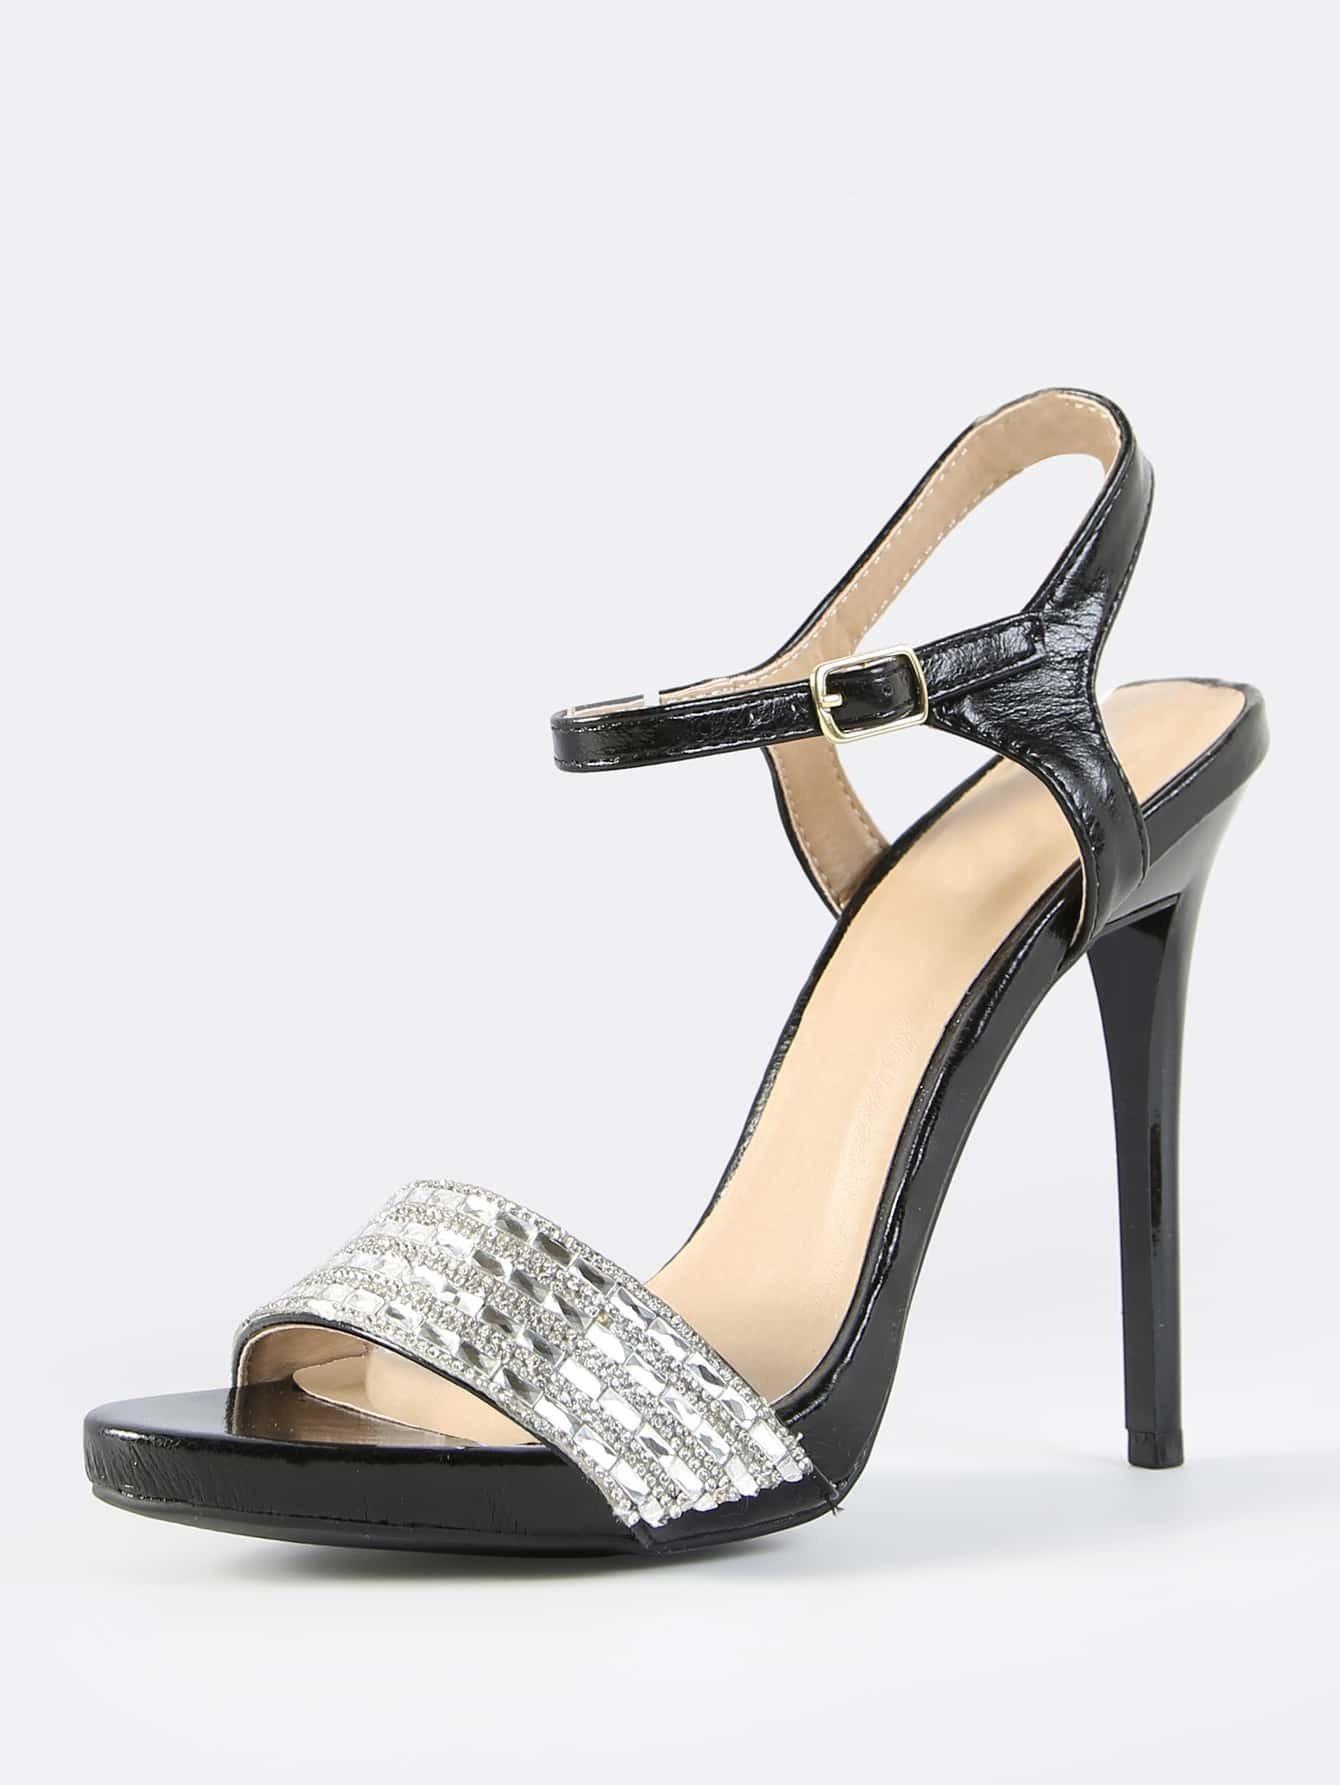 high heel shoe chair value city windsor kits faux leather encrusted crystal heels black shein sheinside